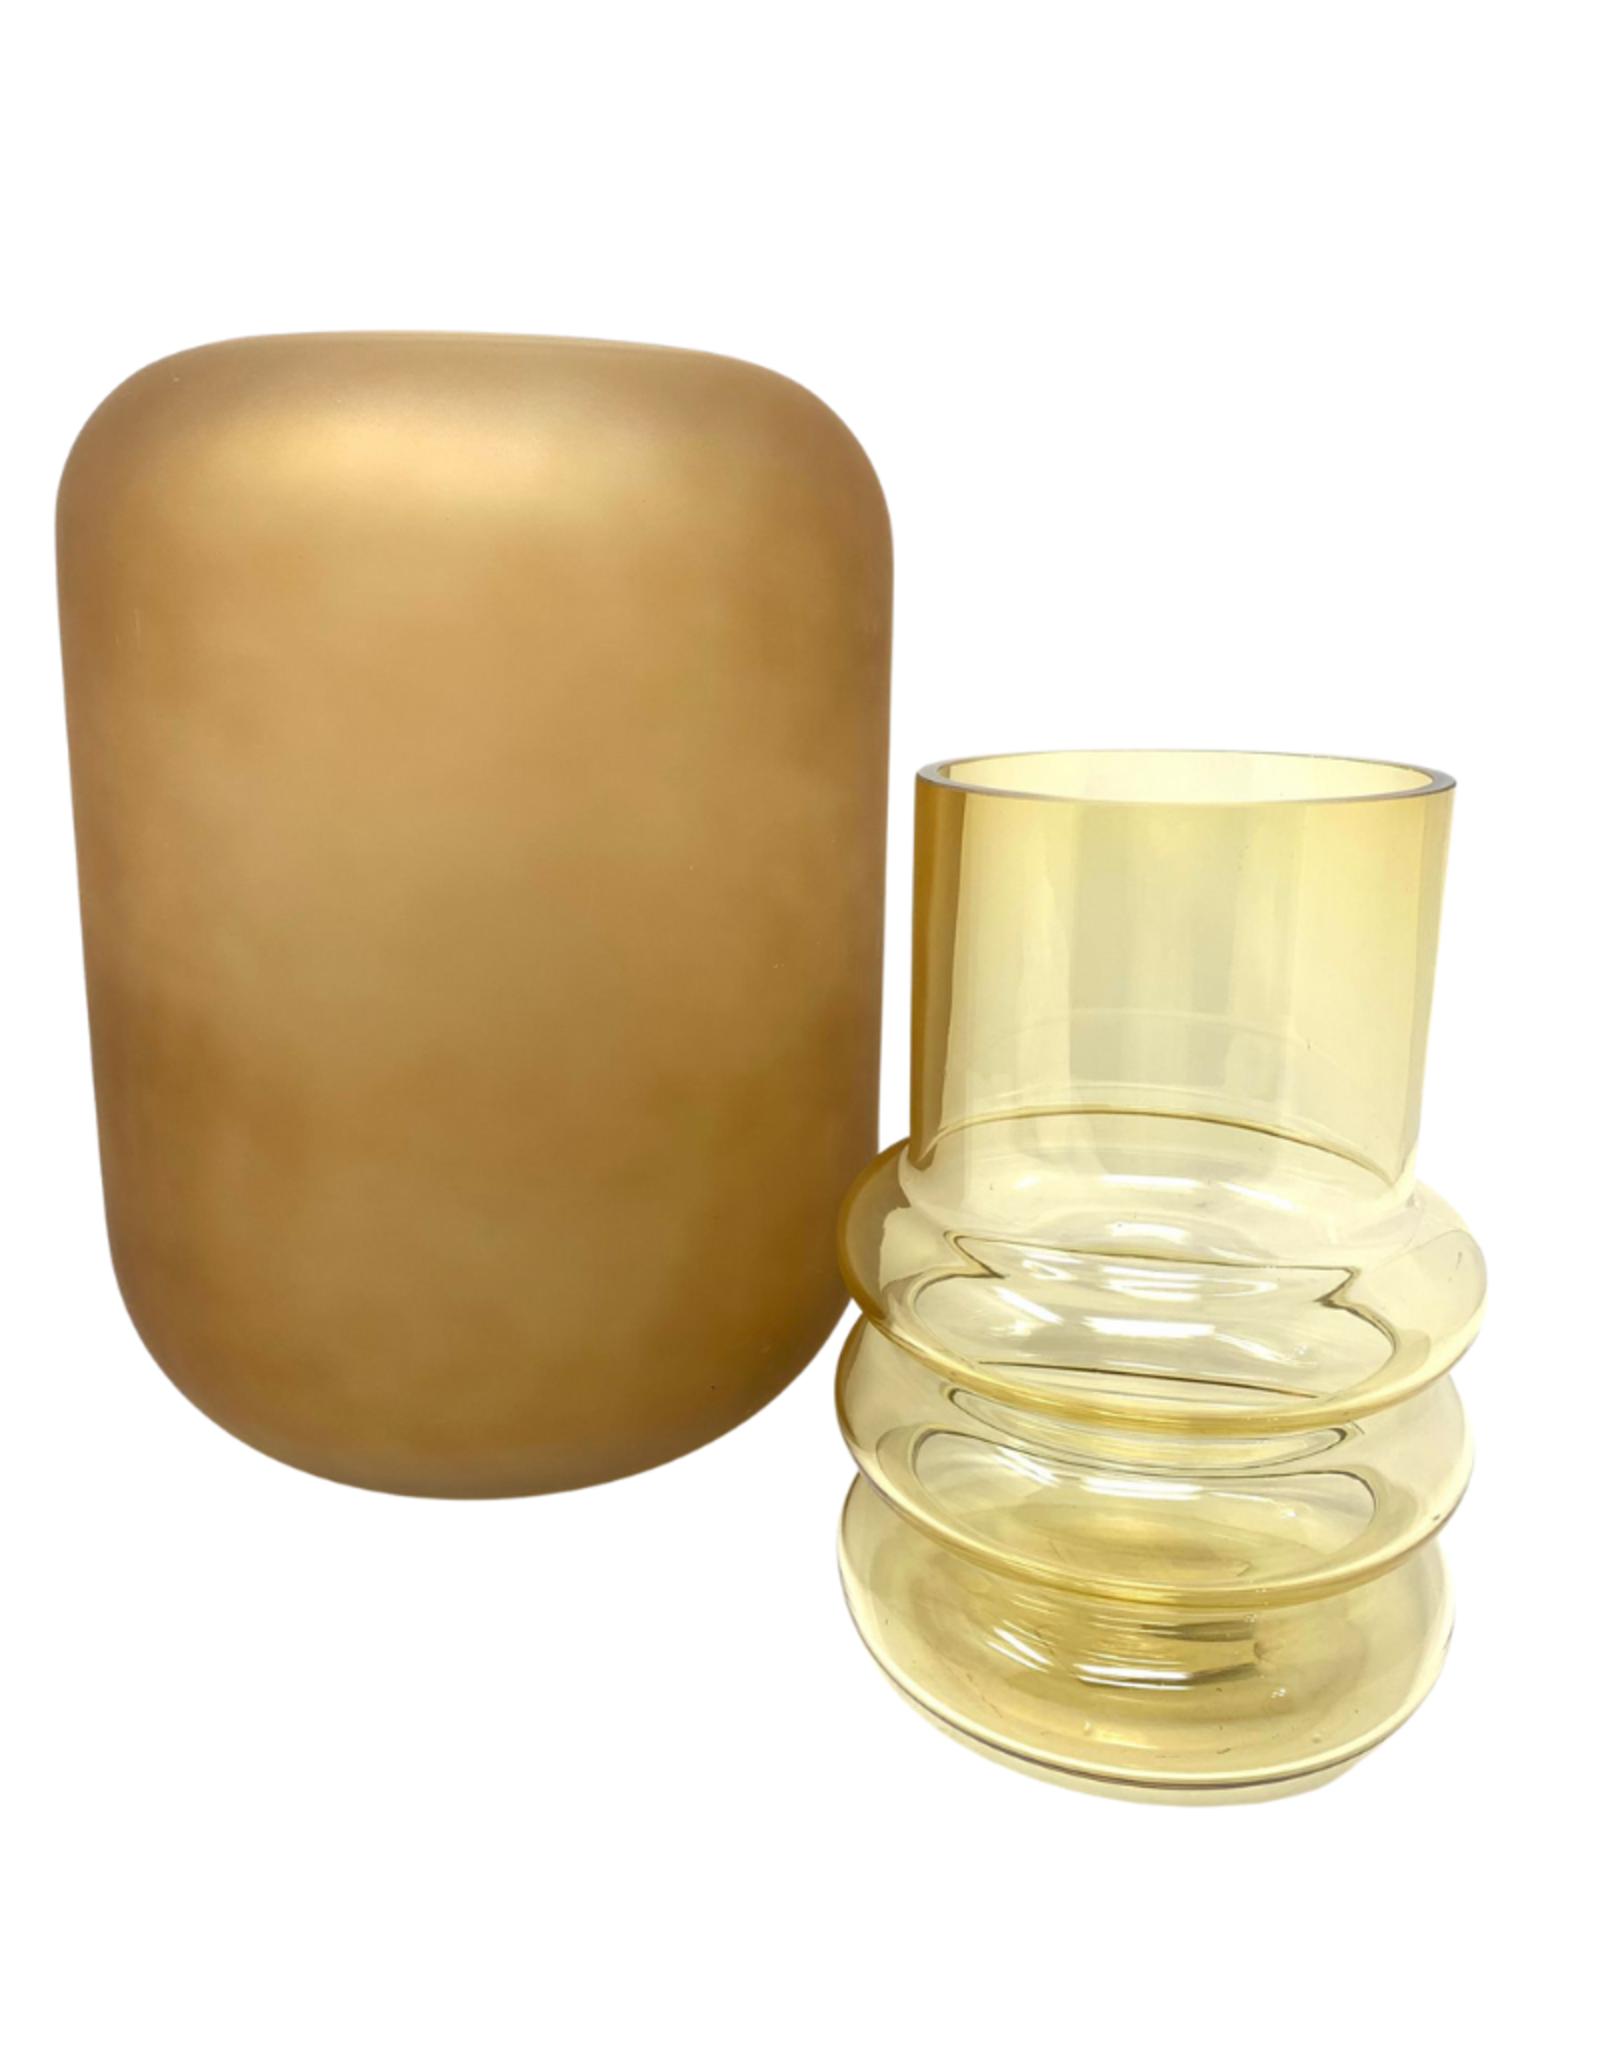 Centralia Small Hand Blown Glass Vase / Oat